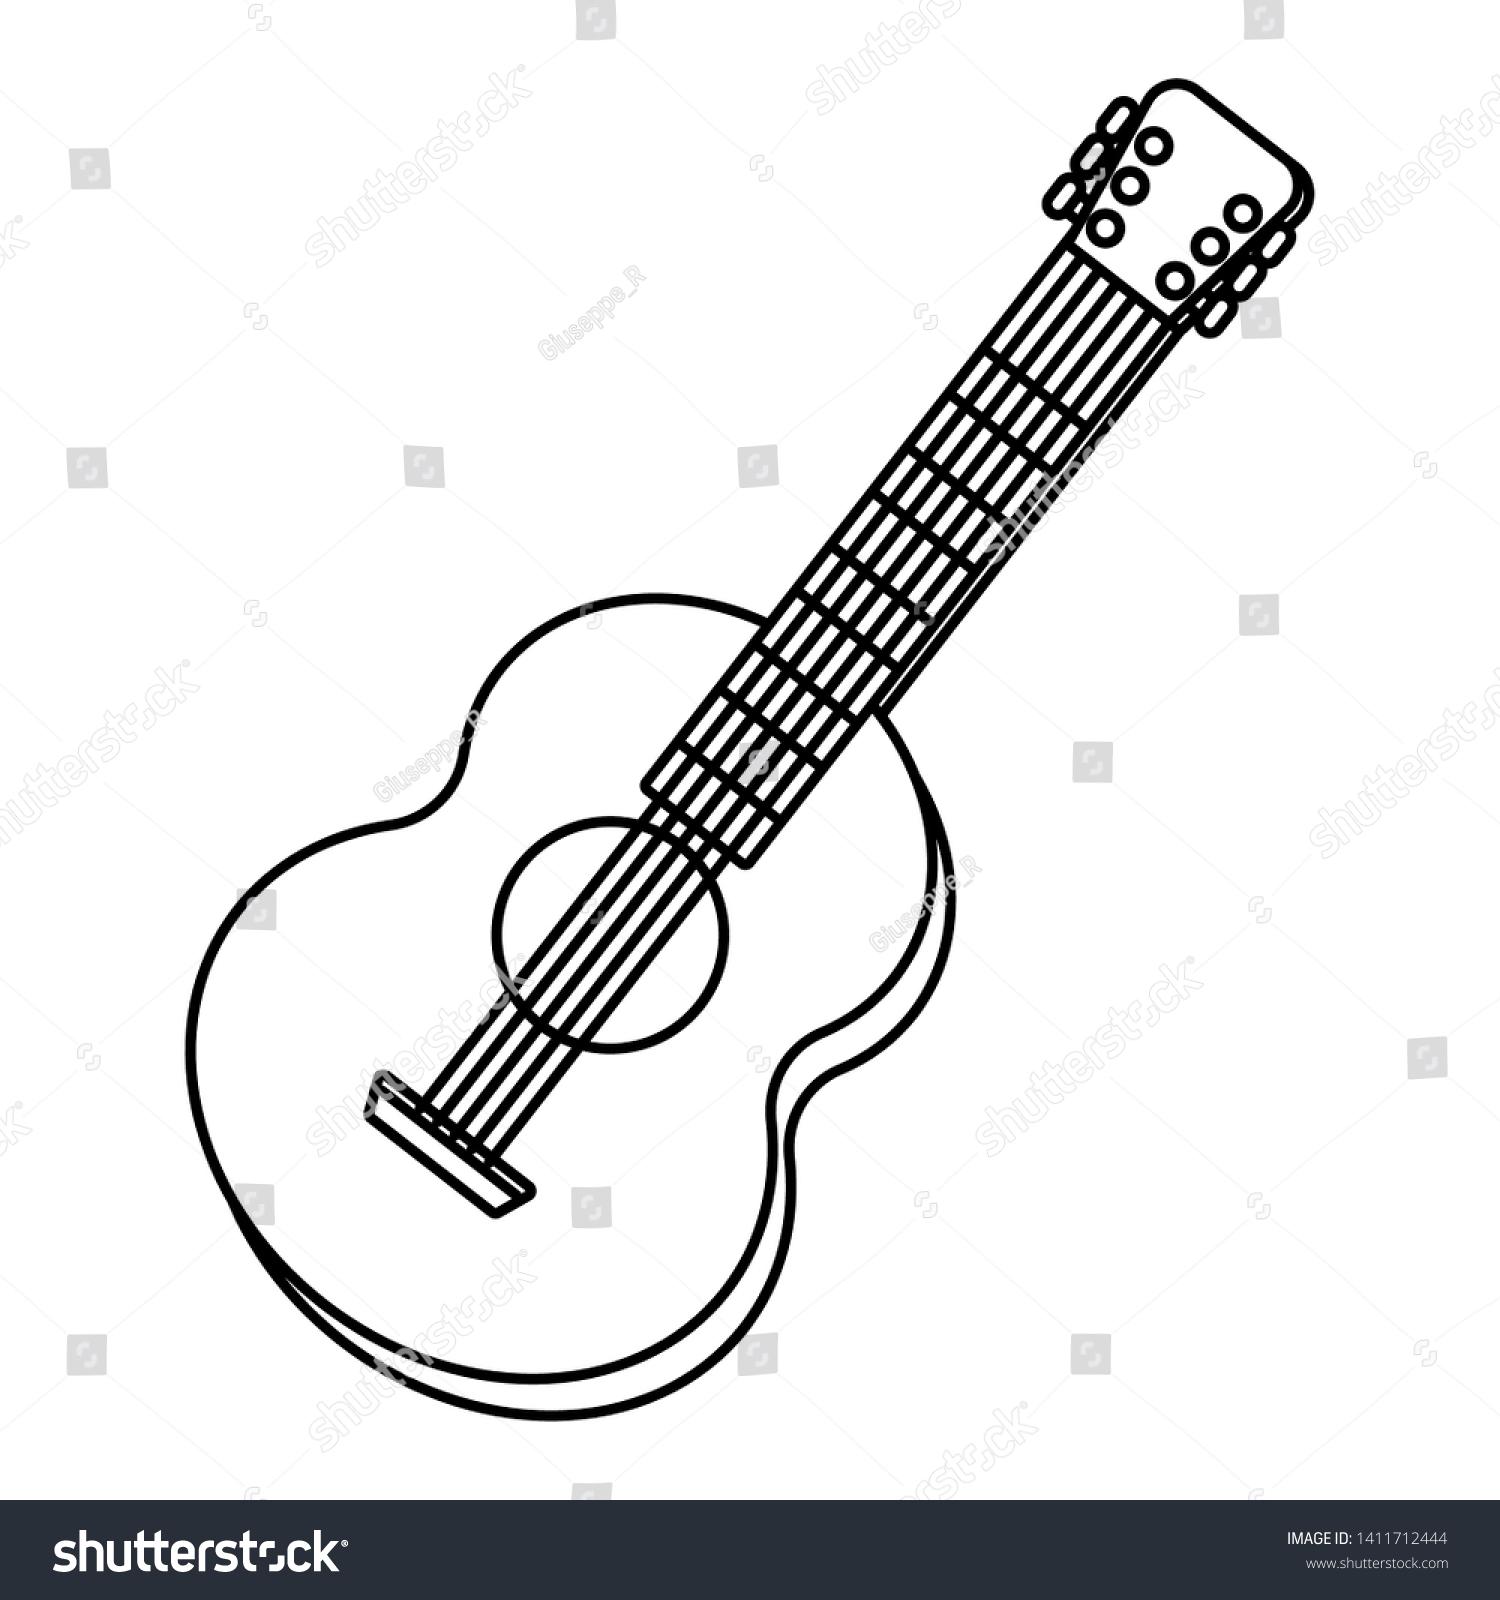 Guitar Tilted Music Instrument Cartoon Black Stock Vector Royalty Free 1411712444